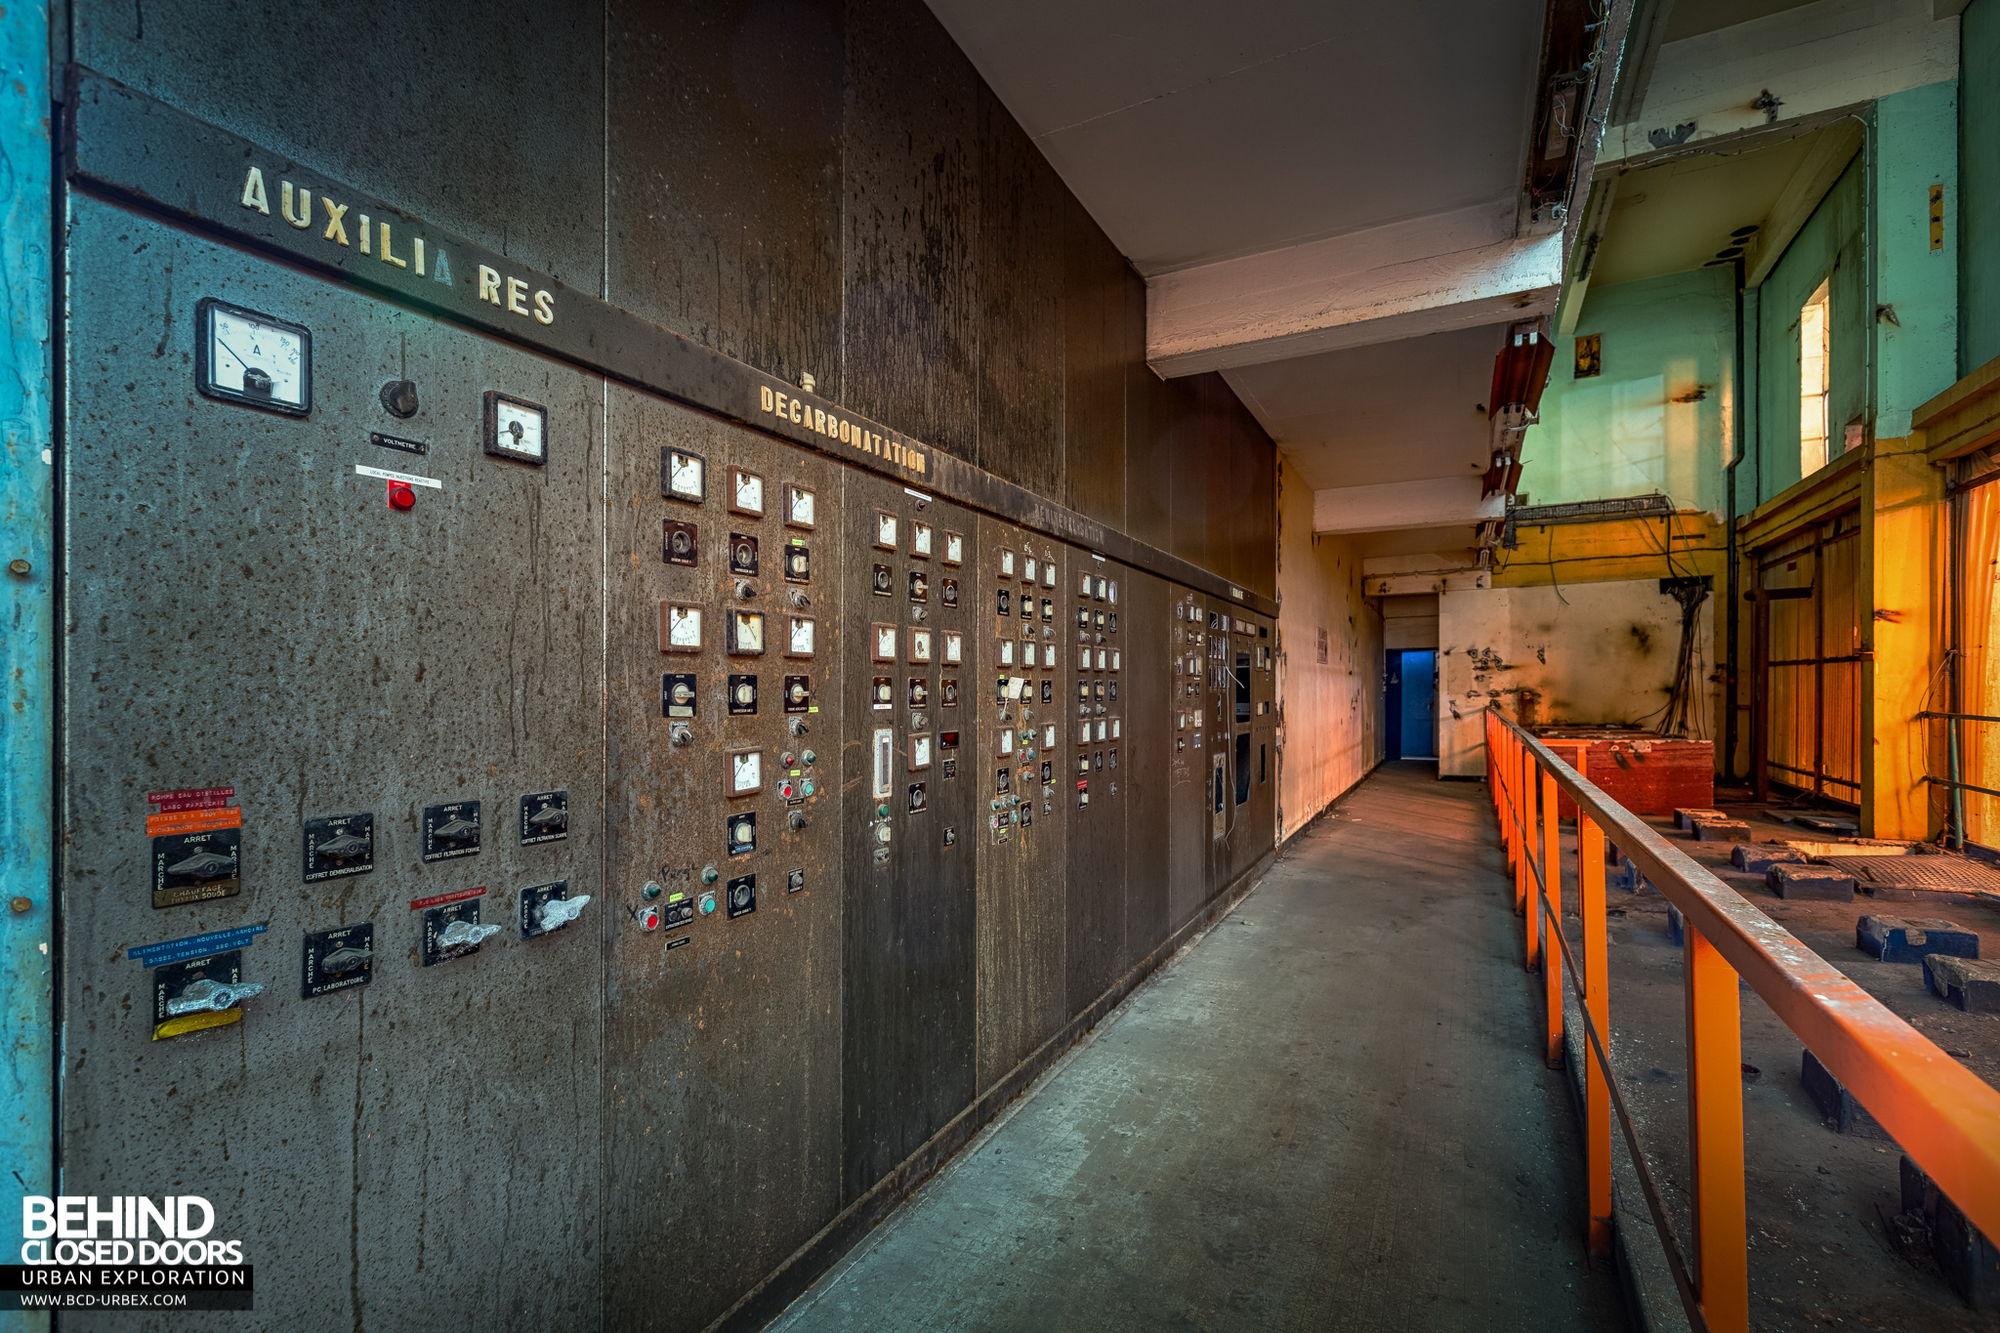 Stora Enso, Corbehem - Old control panels